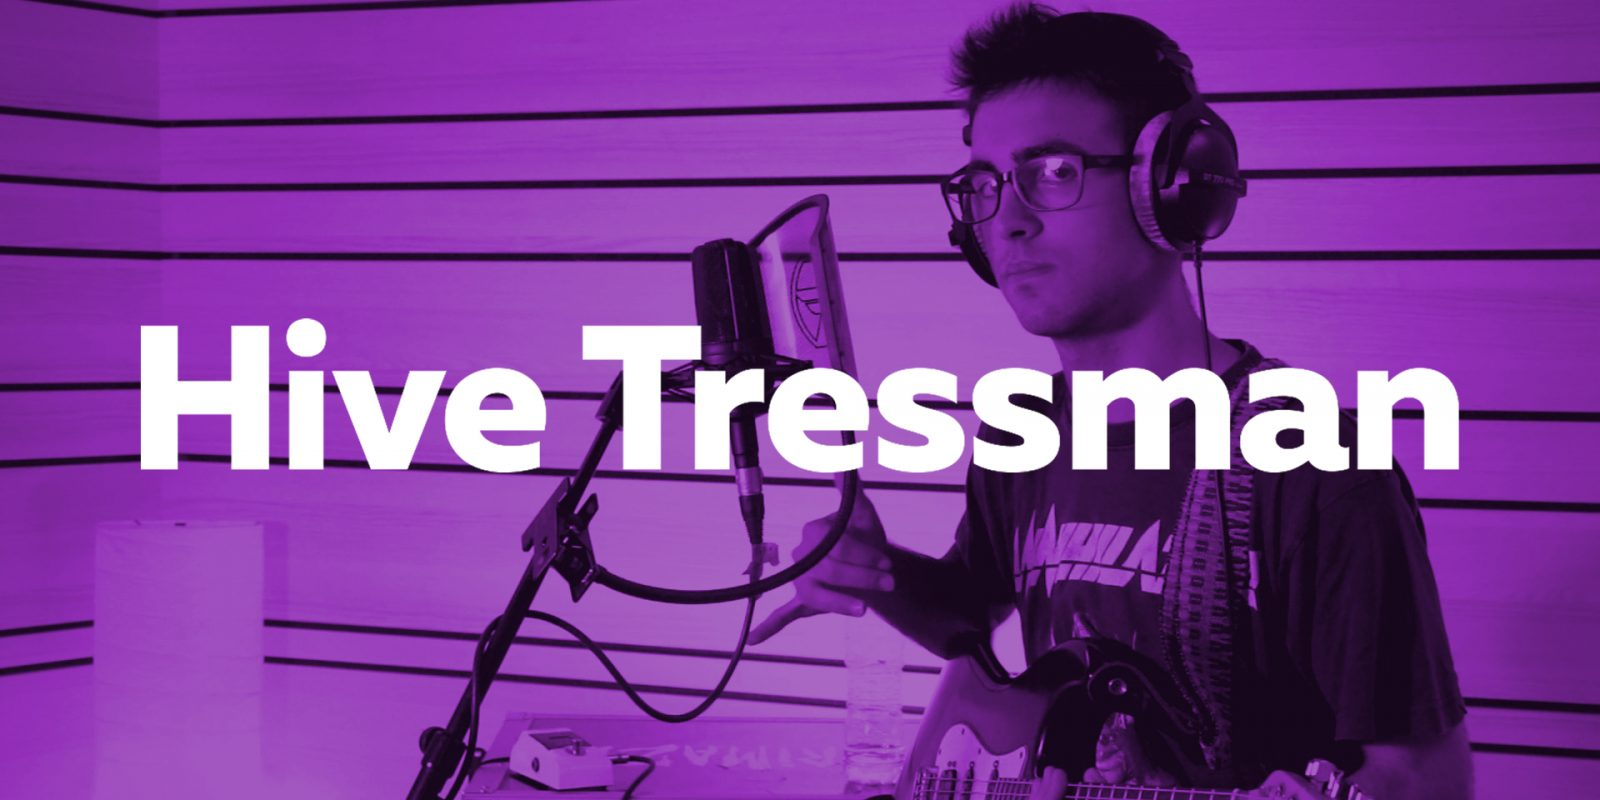 Hive Tressman | PURPLE SESSIONS